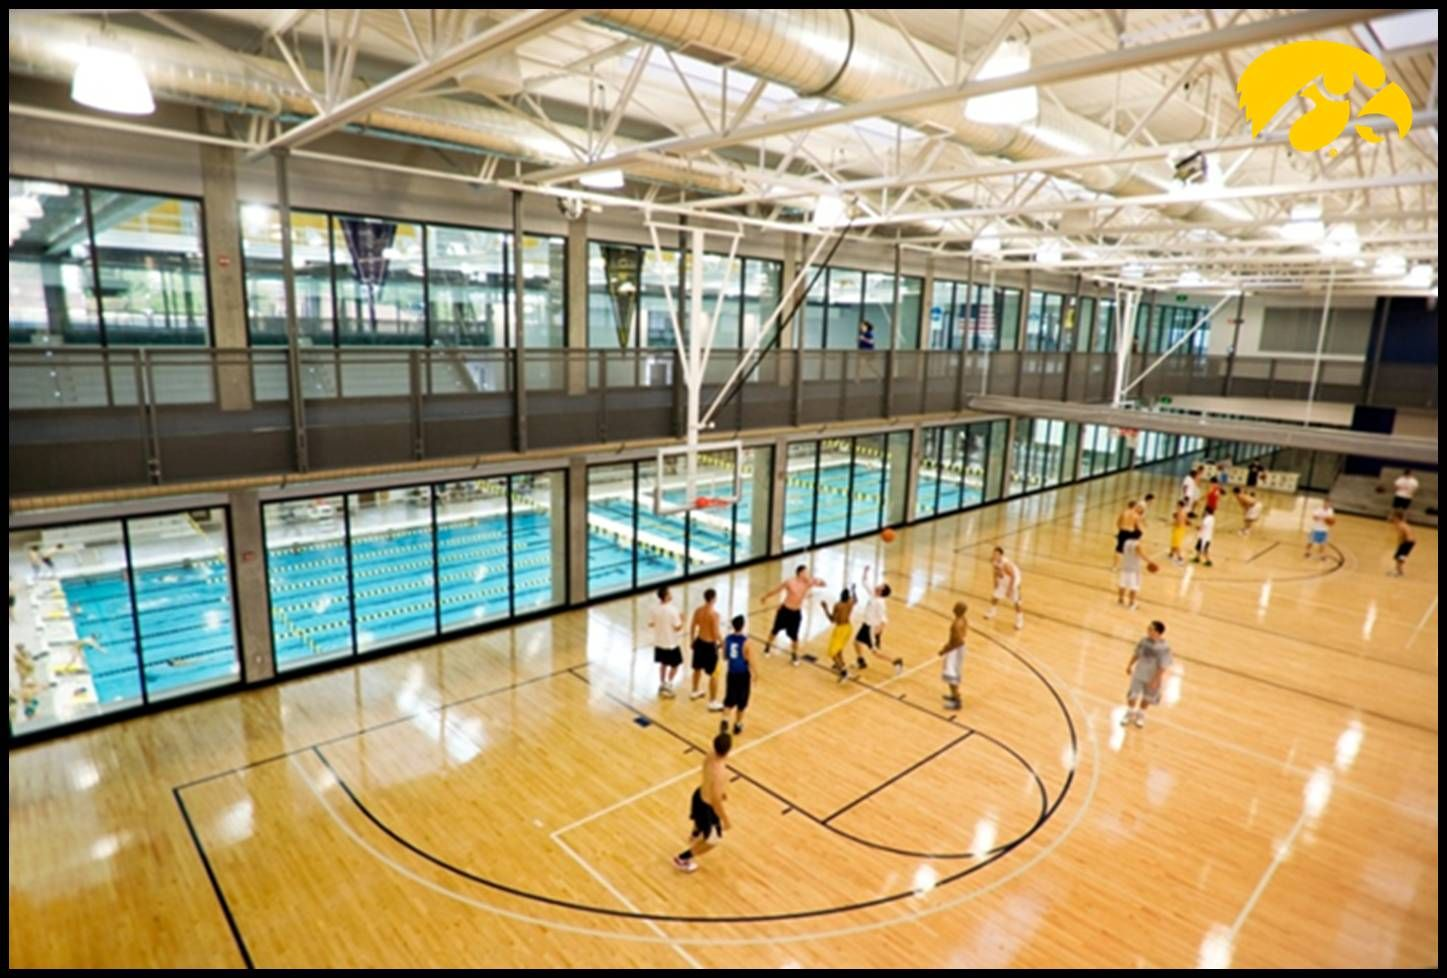 Iowa S Basketball Courts Provide A Scenic View Over The Aquatics Area Recreation Centers Sports Training Facility Sports Complex